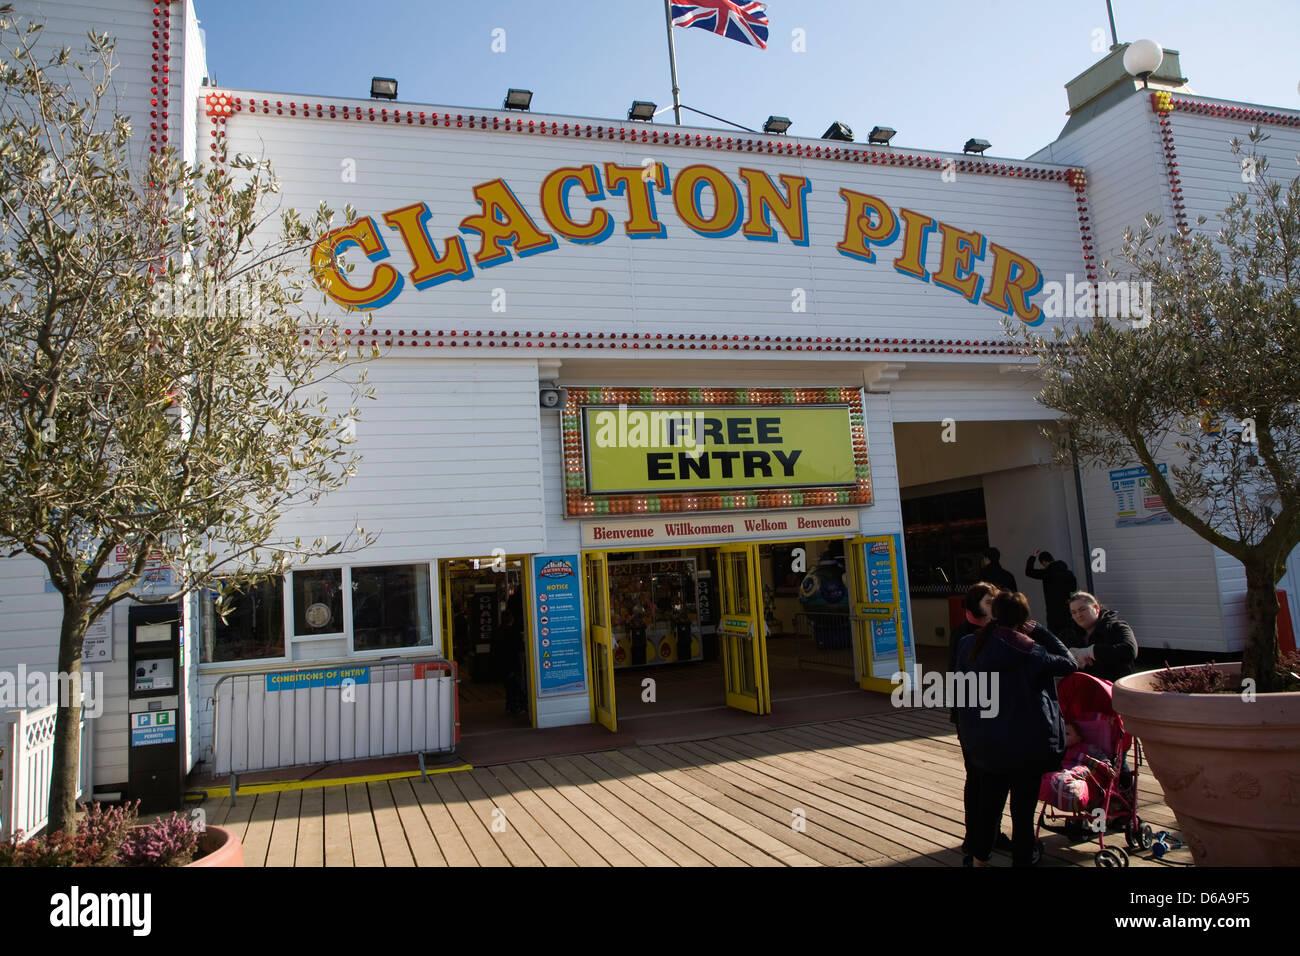 Clacton Pier, Essex, England - Stock Image